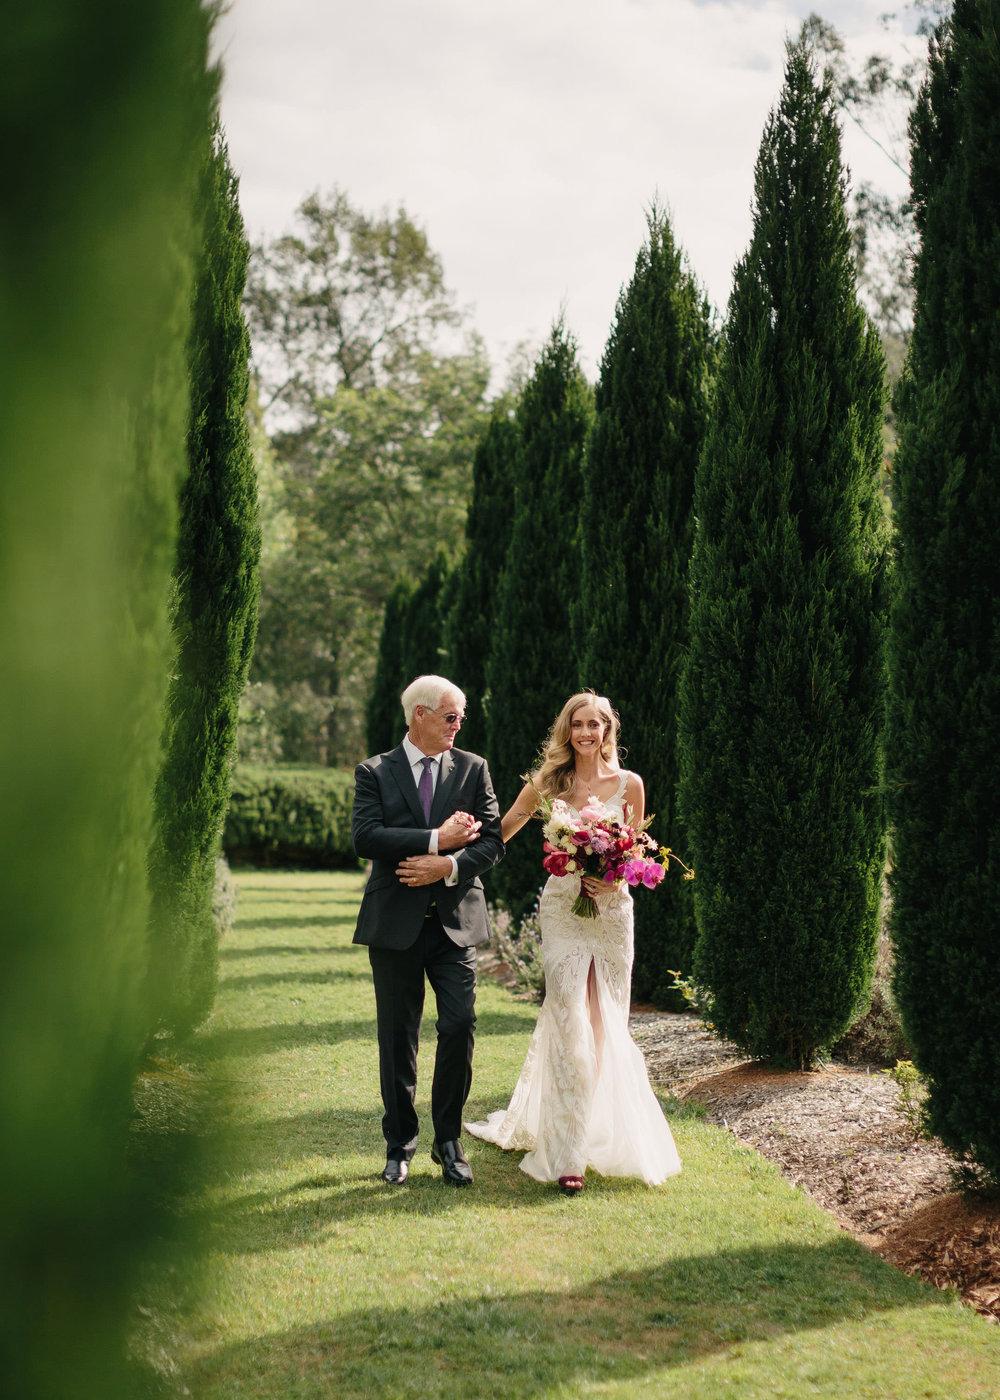 036_hunter_valley_wedding_photography_redleaf_paul_bamford_finchandoak.jpg